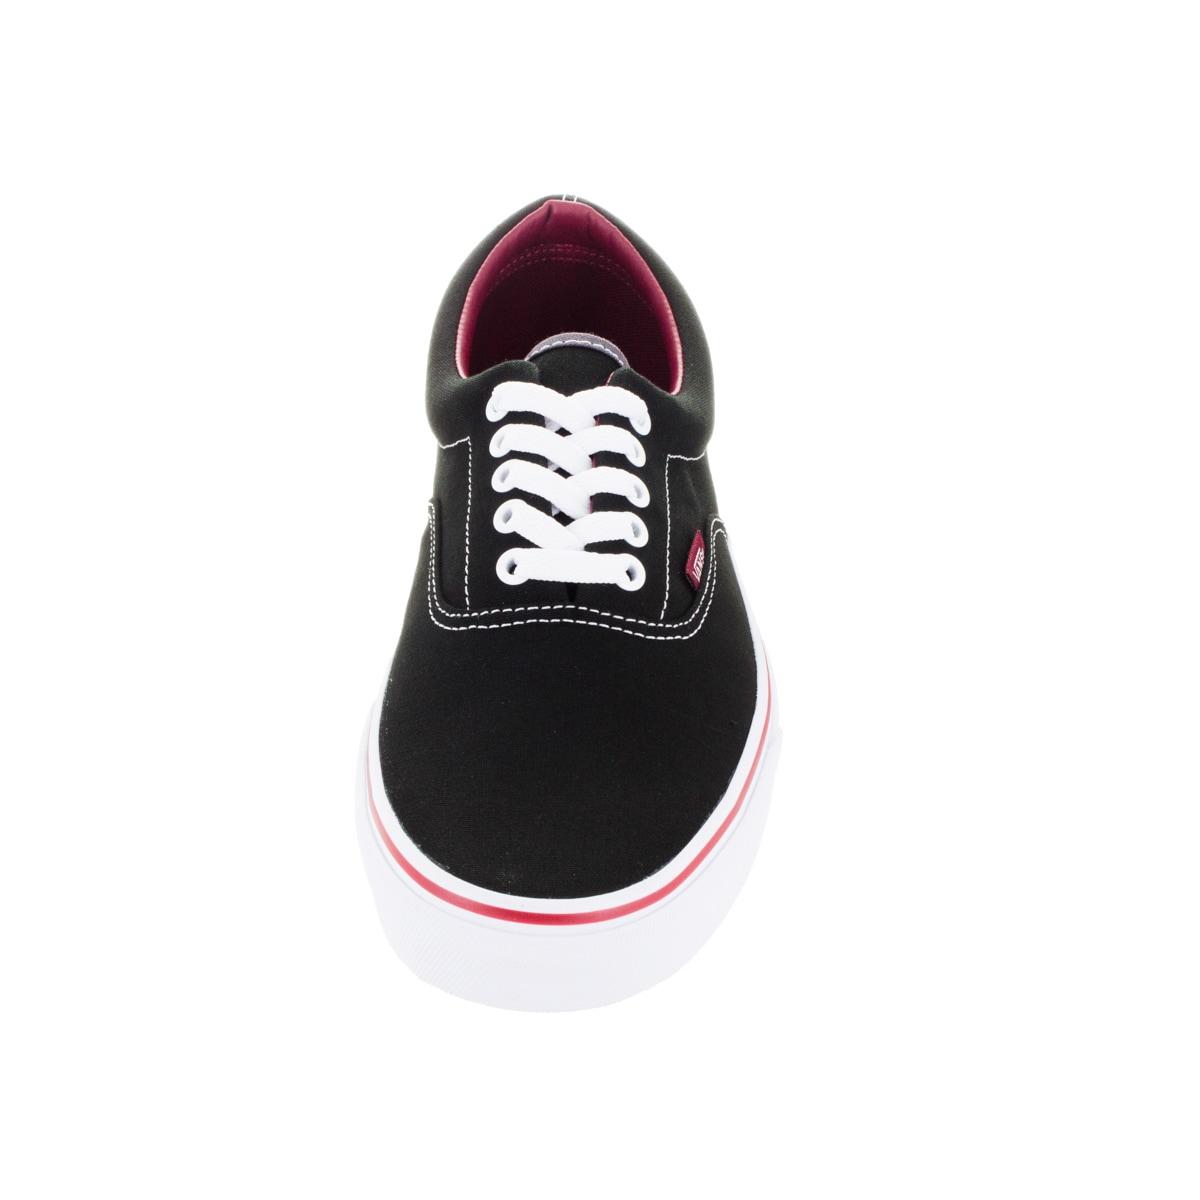 122c46fa9d Shop Vans Unisex Era Pop Black Rhubarb Canvas Skate Shoe - Free Shipping  Today - Overstock - 12115974